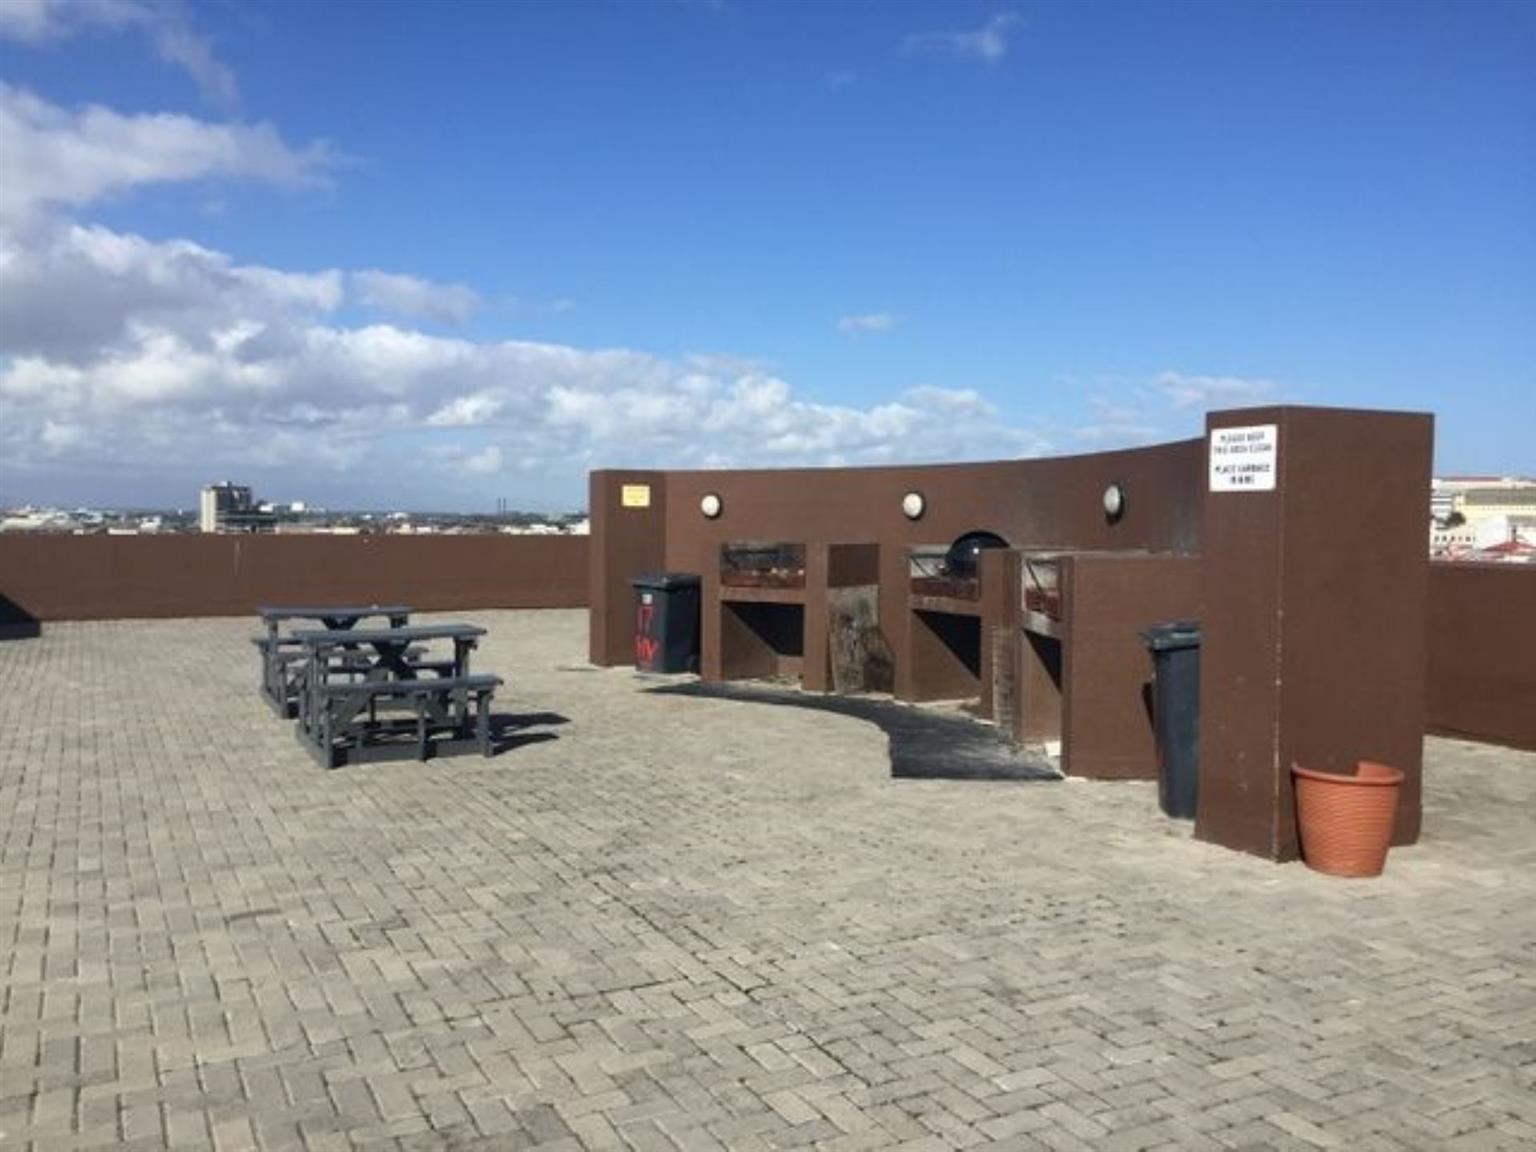 Apartment Rental Monthly in WOODSTOCK